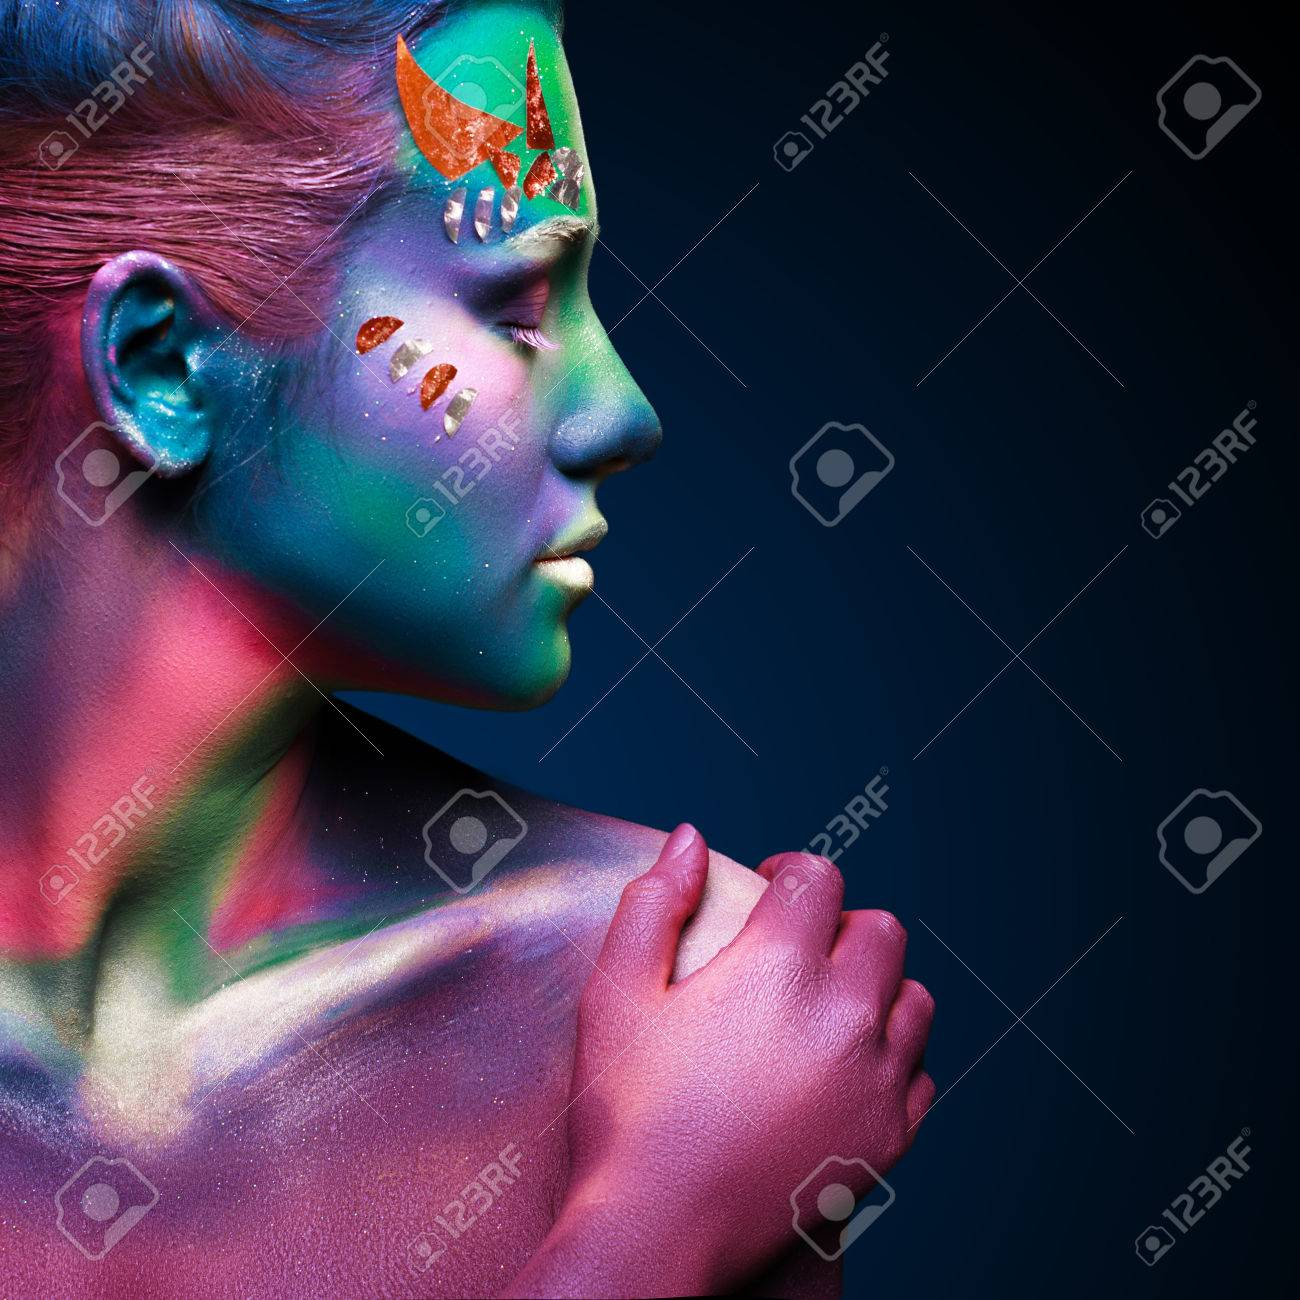 Portrait of beautiful woman with body art - 41236039